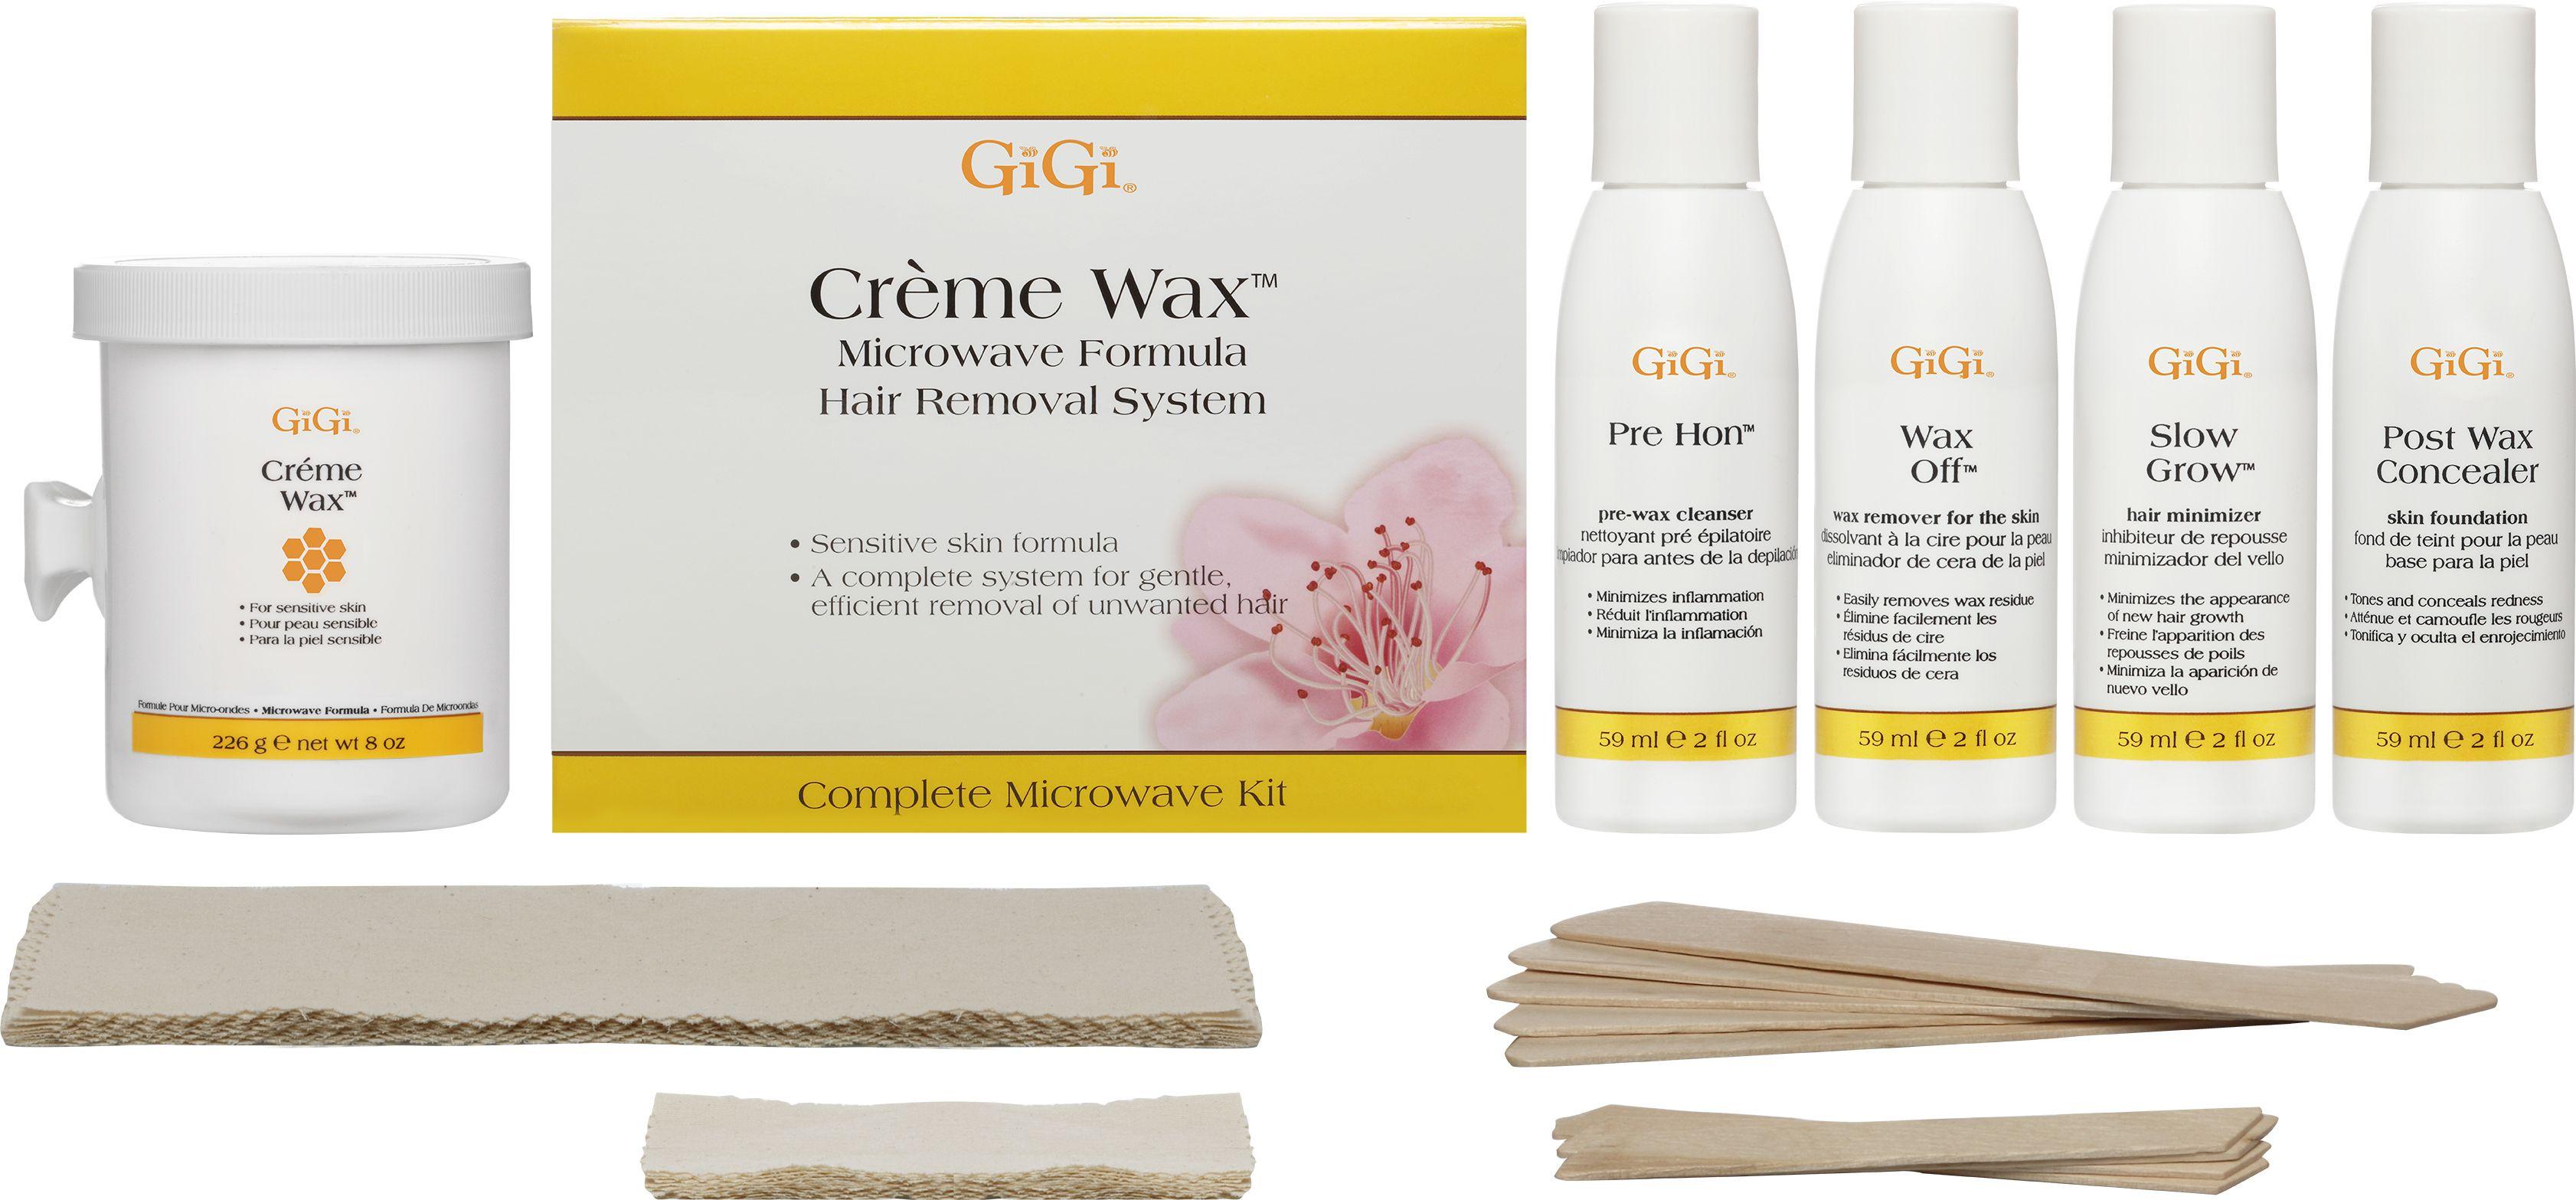 Creme Wax Microwave Kit Includes A Gentle Wax Formula Recommended For Sensitive Skin Gigi Gigispa Waxi Waxing Kit Brazilian Bikini Wax Sally Beauty Supply